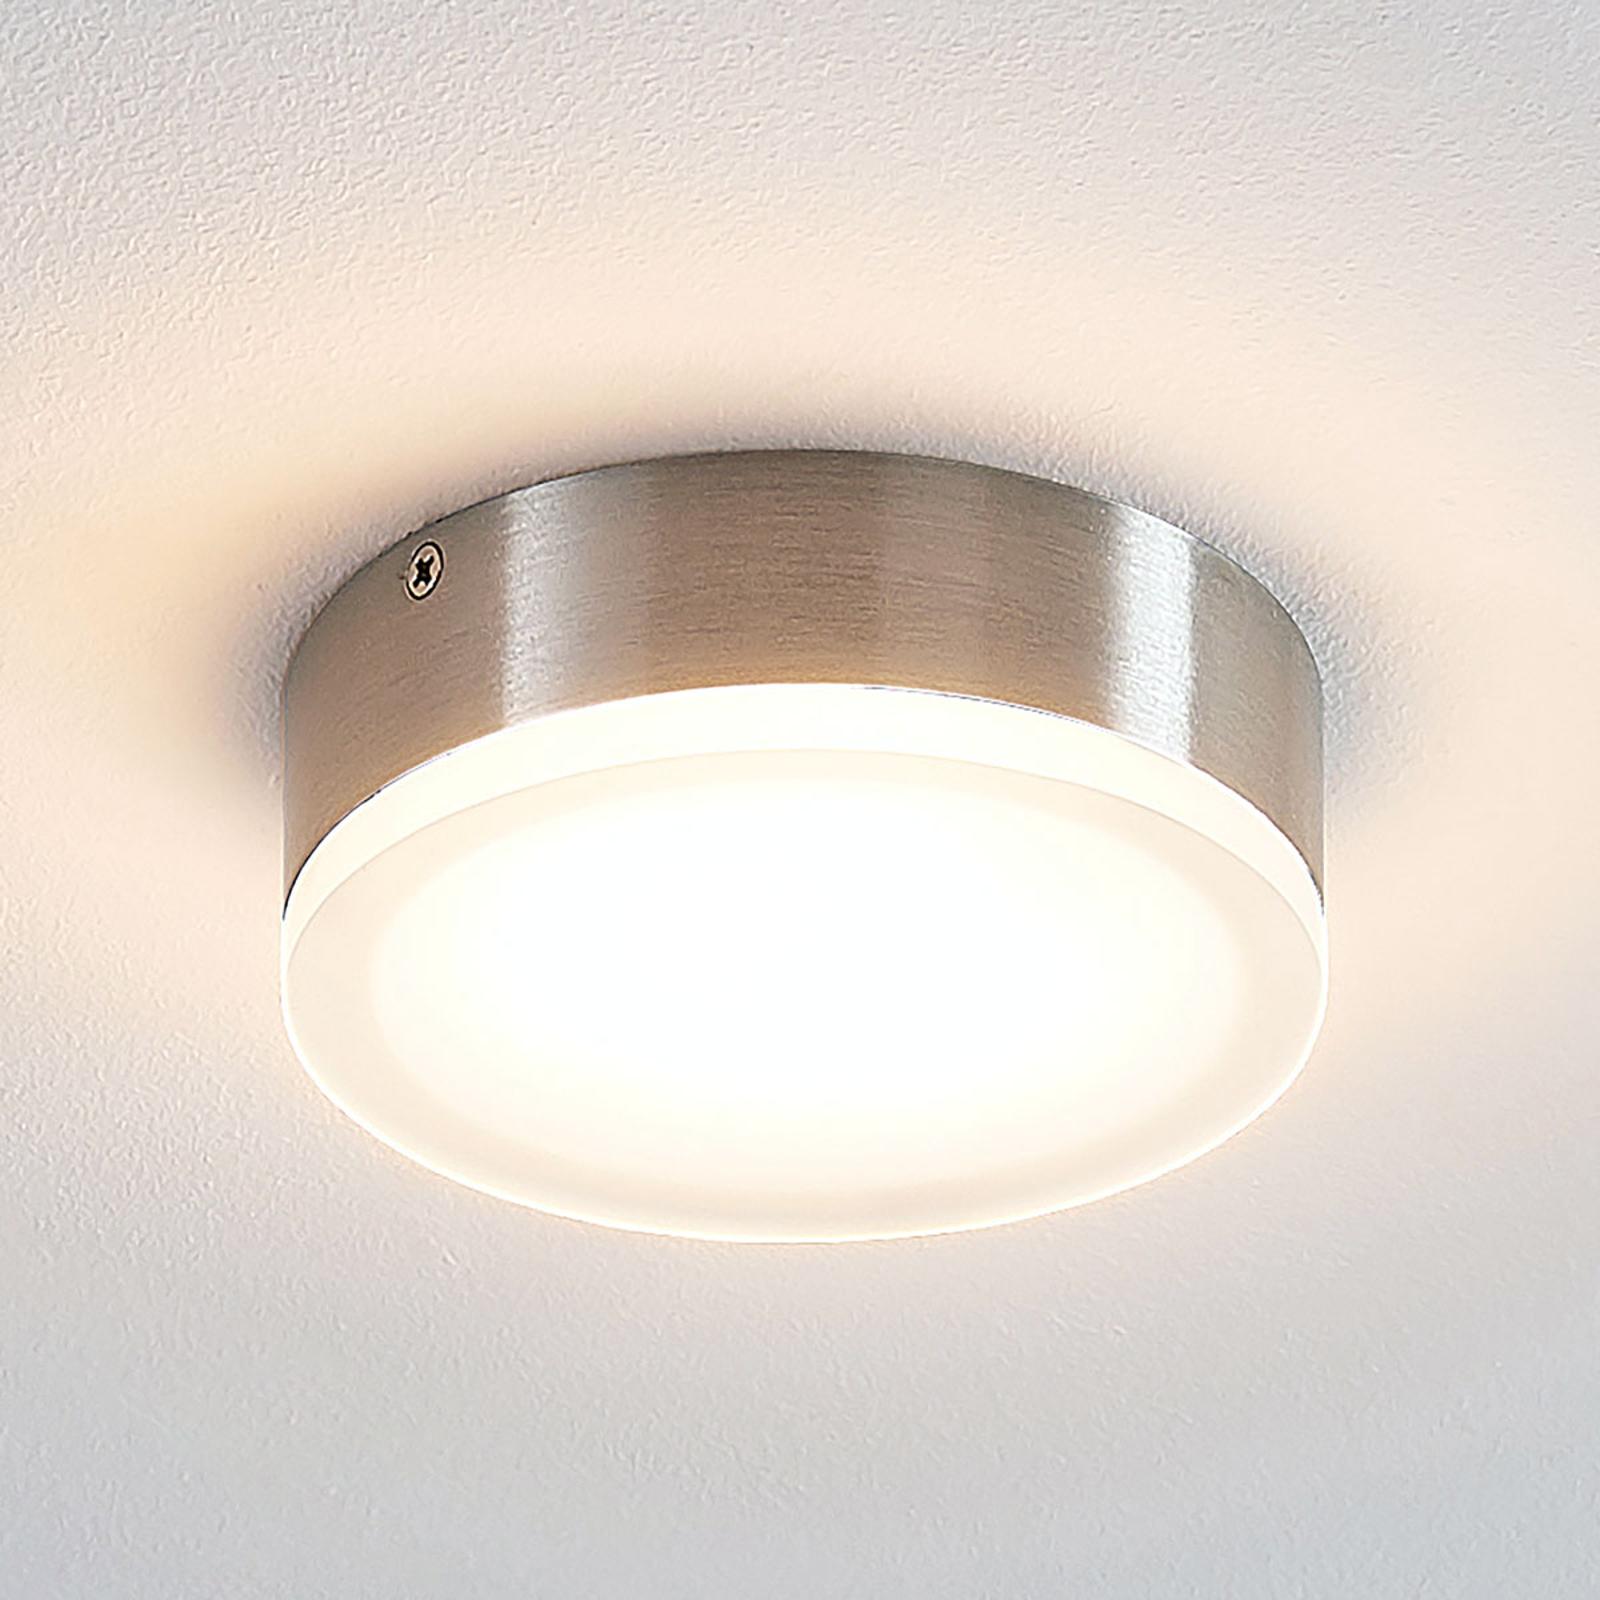 Lindby Leonta LED plafondlamp, nikkel, Ø 12 cm